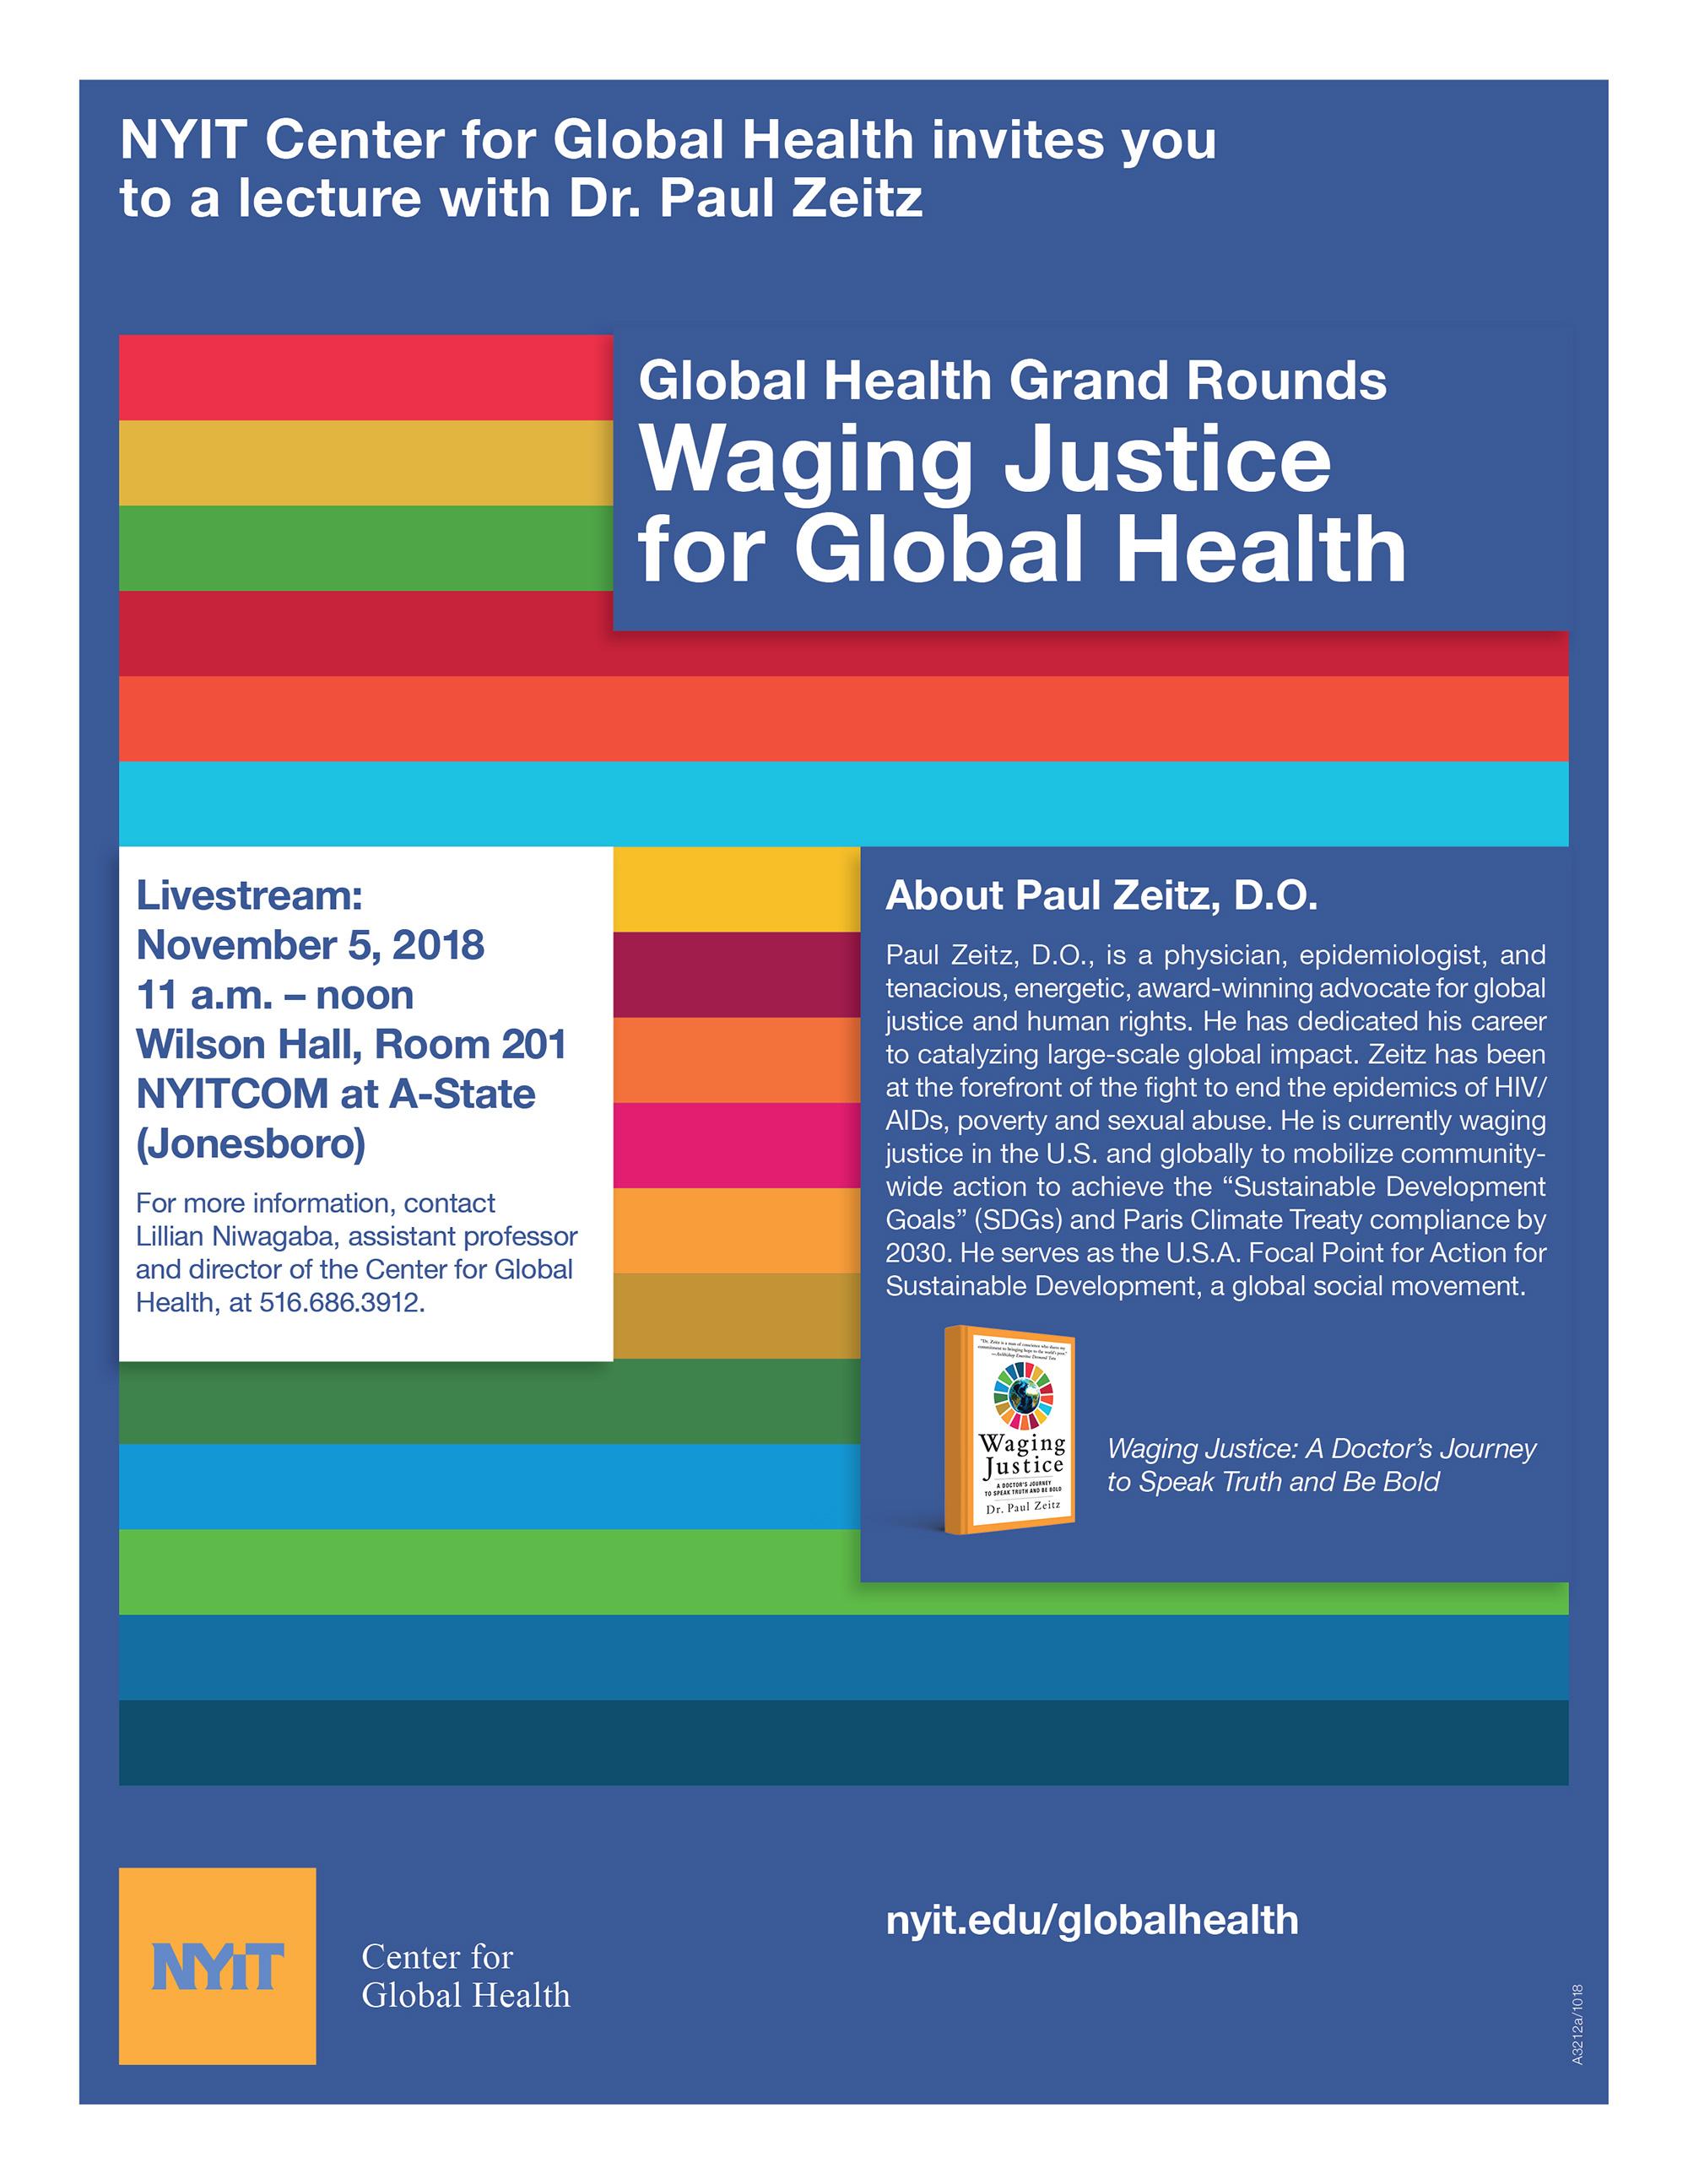 A3212a_Global_Health_Challenges_Evite_November.jpg